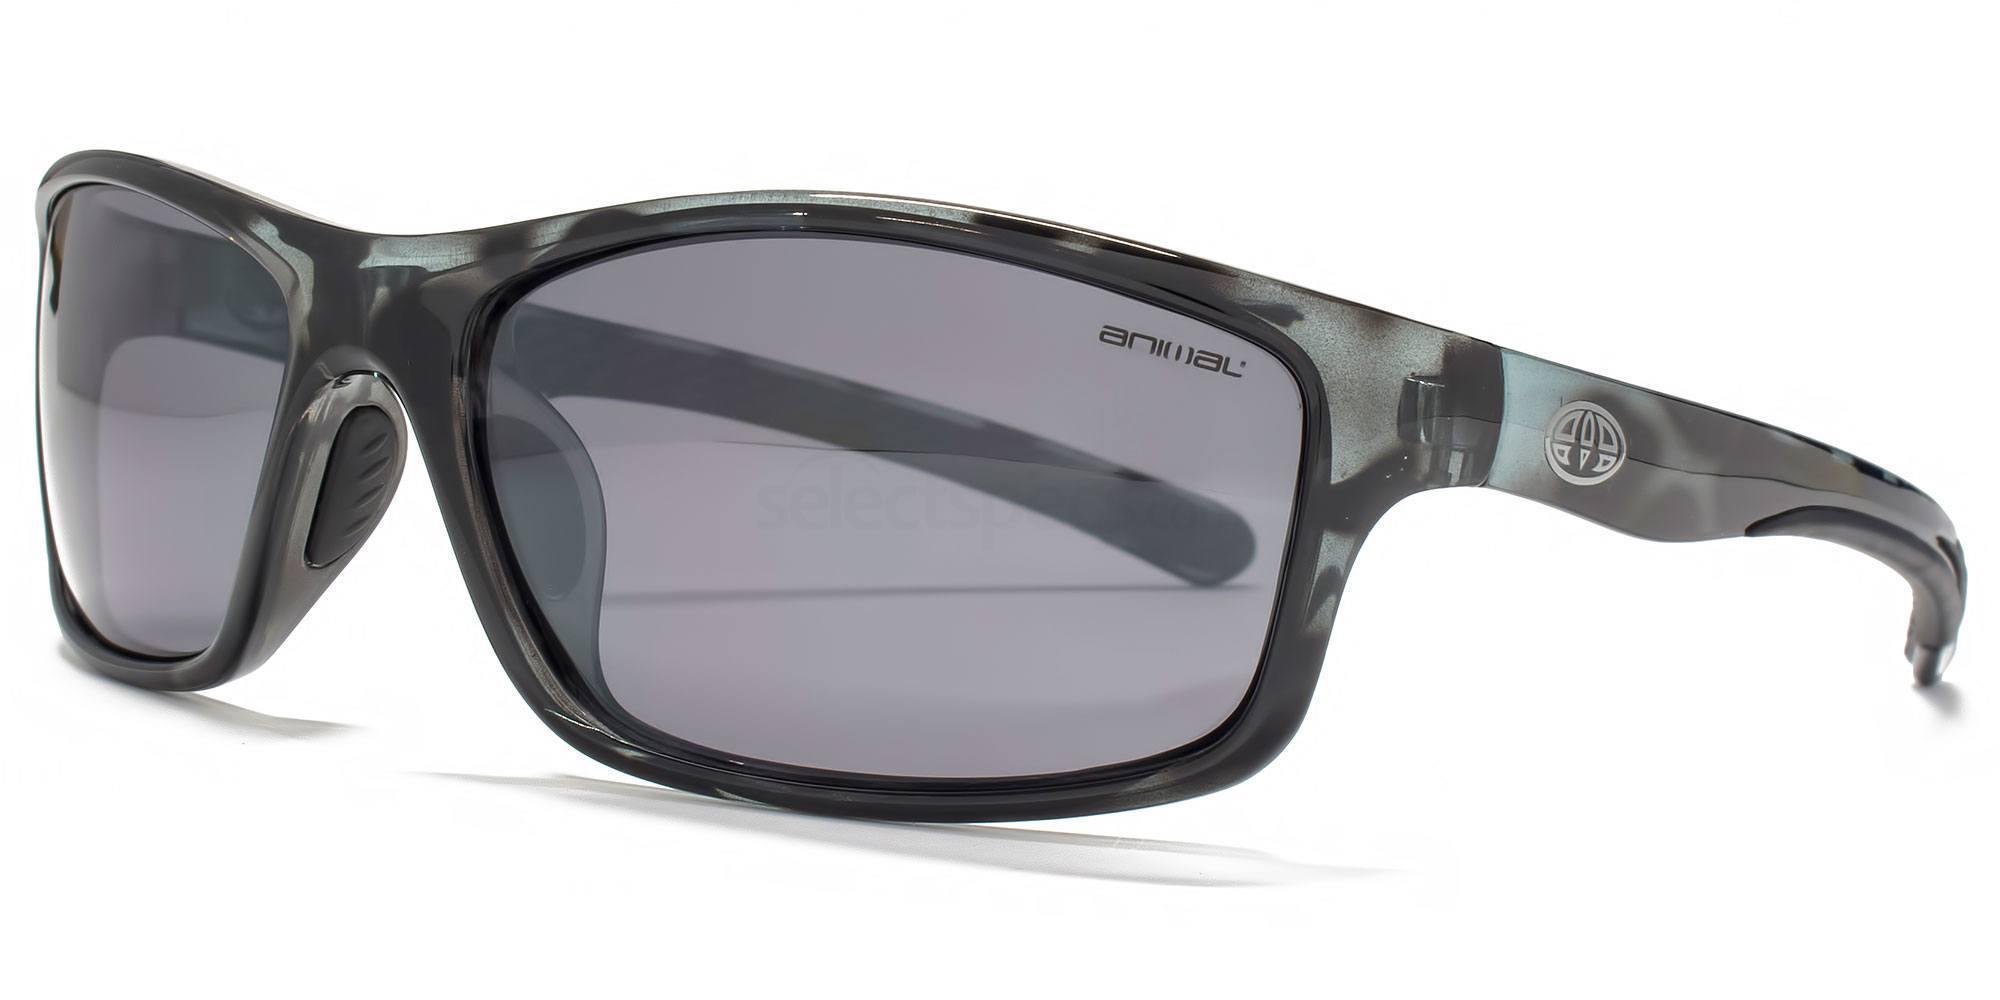 ANI015 CHASED Sunglasses, Animal